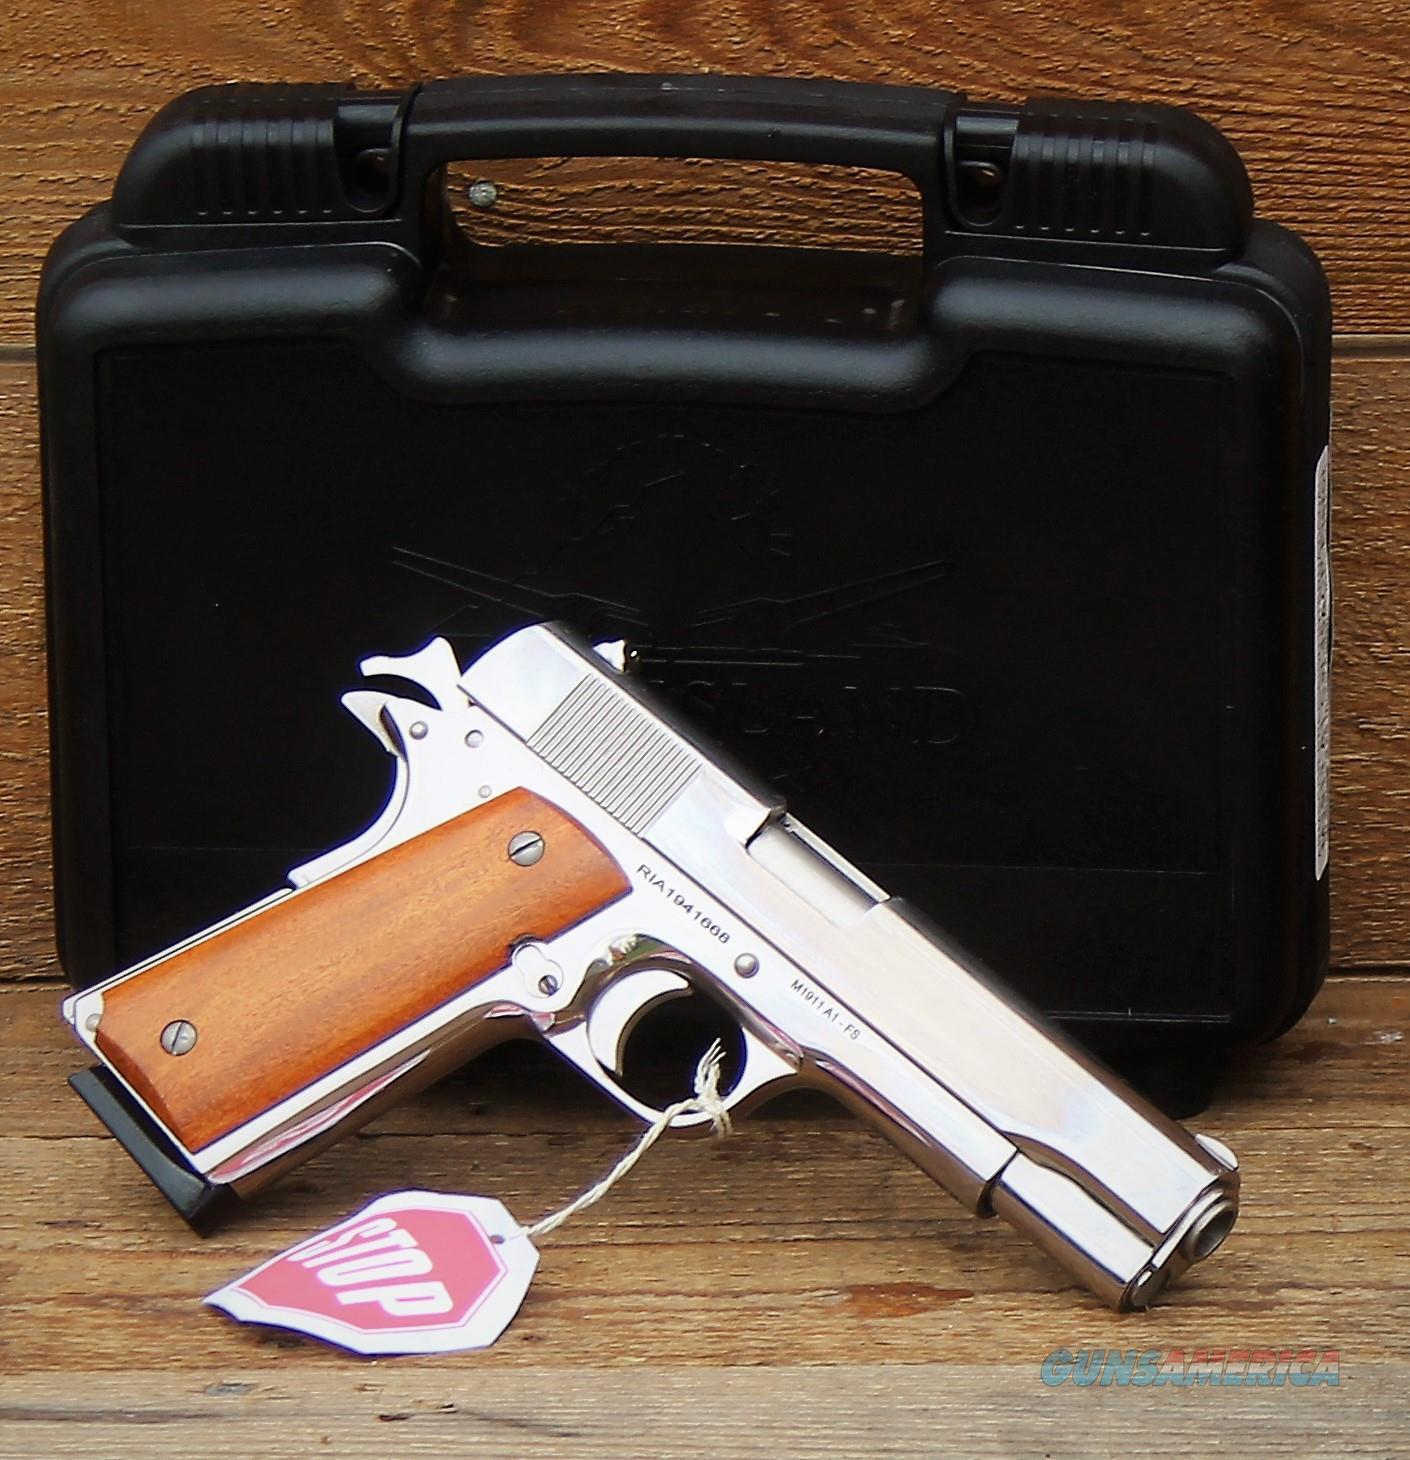 "$65 EASY PAY ARMSCOR Precision International High Polished NICKEL  1911  Rock Island Armory  STANDARD GI SERIES FS  SA 1911-A1 Beavertail  Grip Safety RIA 5"" barrel 1:16"" twist   Steel Frame 1911A1 Fixed sights GI Hard CASE Wood Grips 51433  Guns > Pistols > Rock Island Armory Pistols > Rock Island"